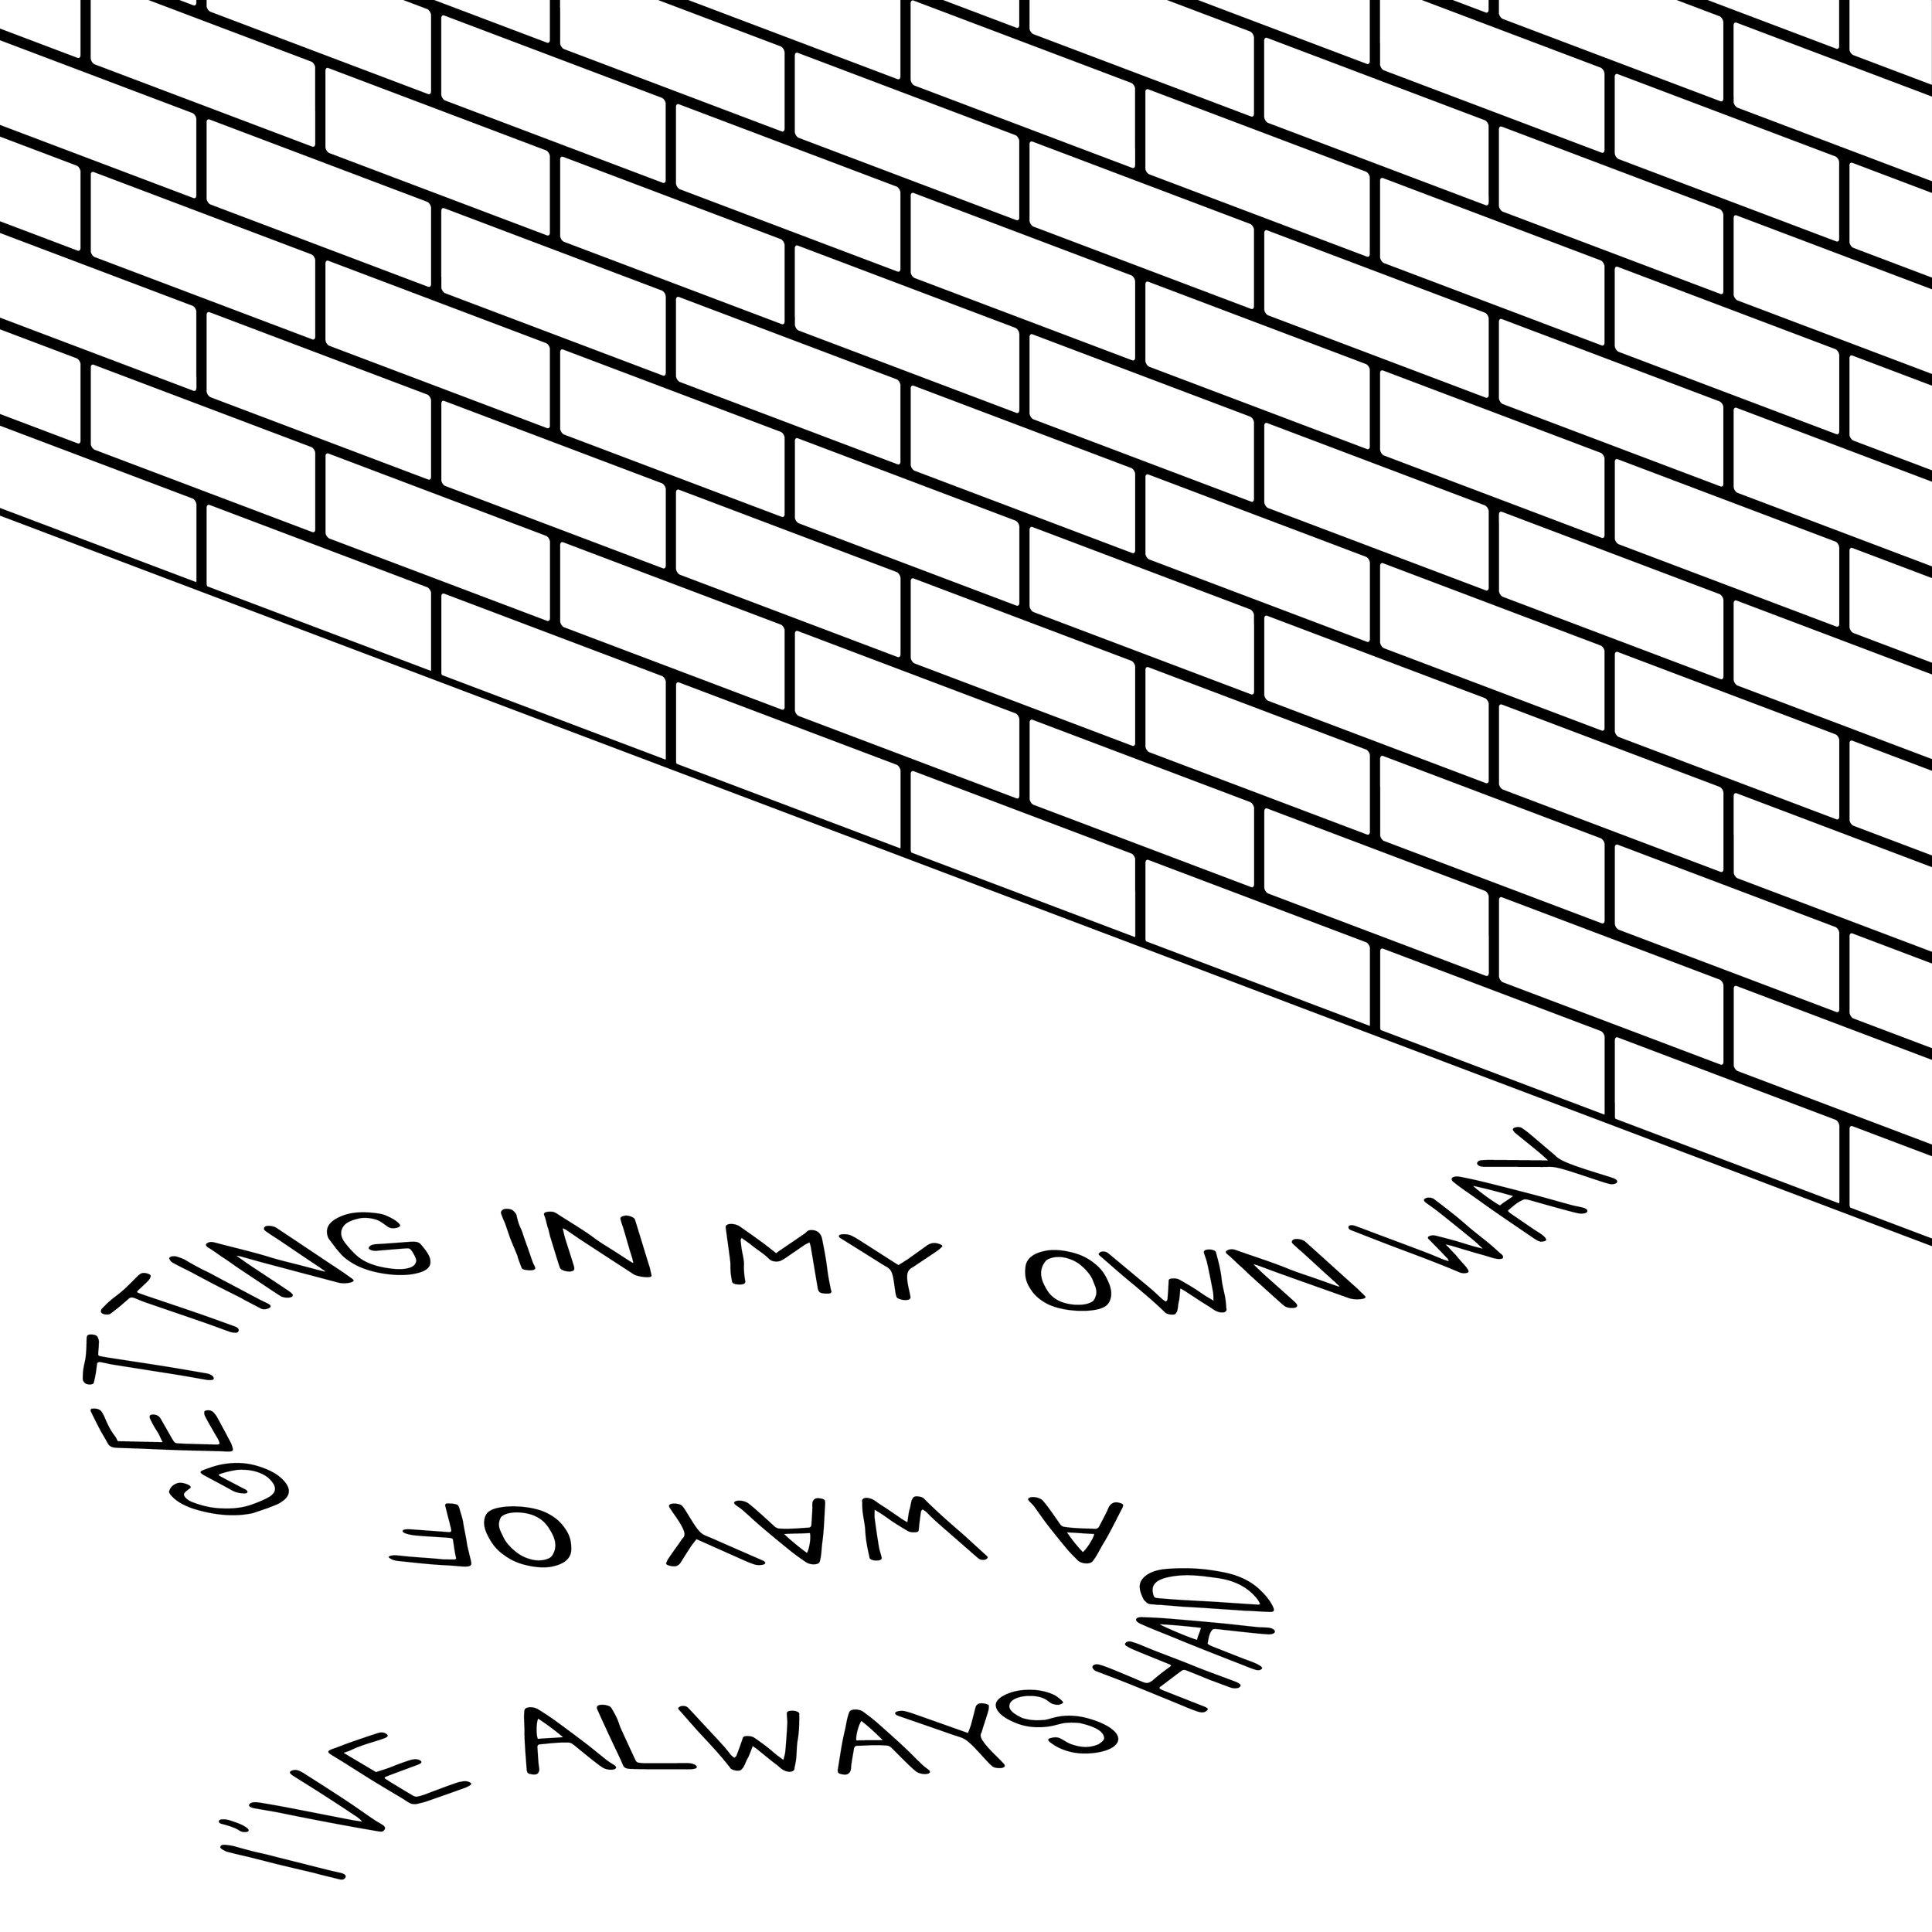 gettinginmyownway-01.jpg